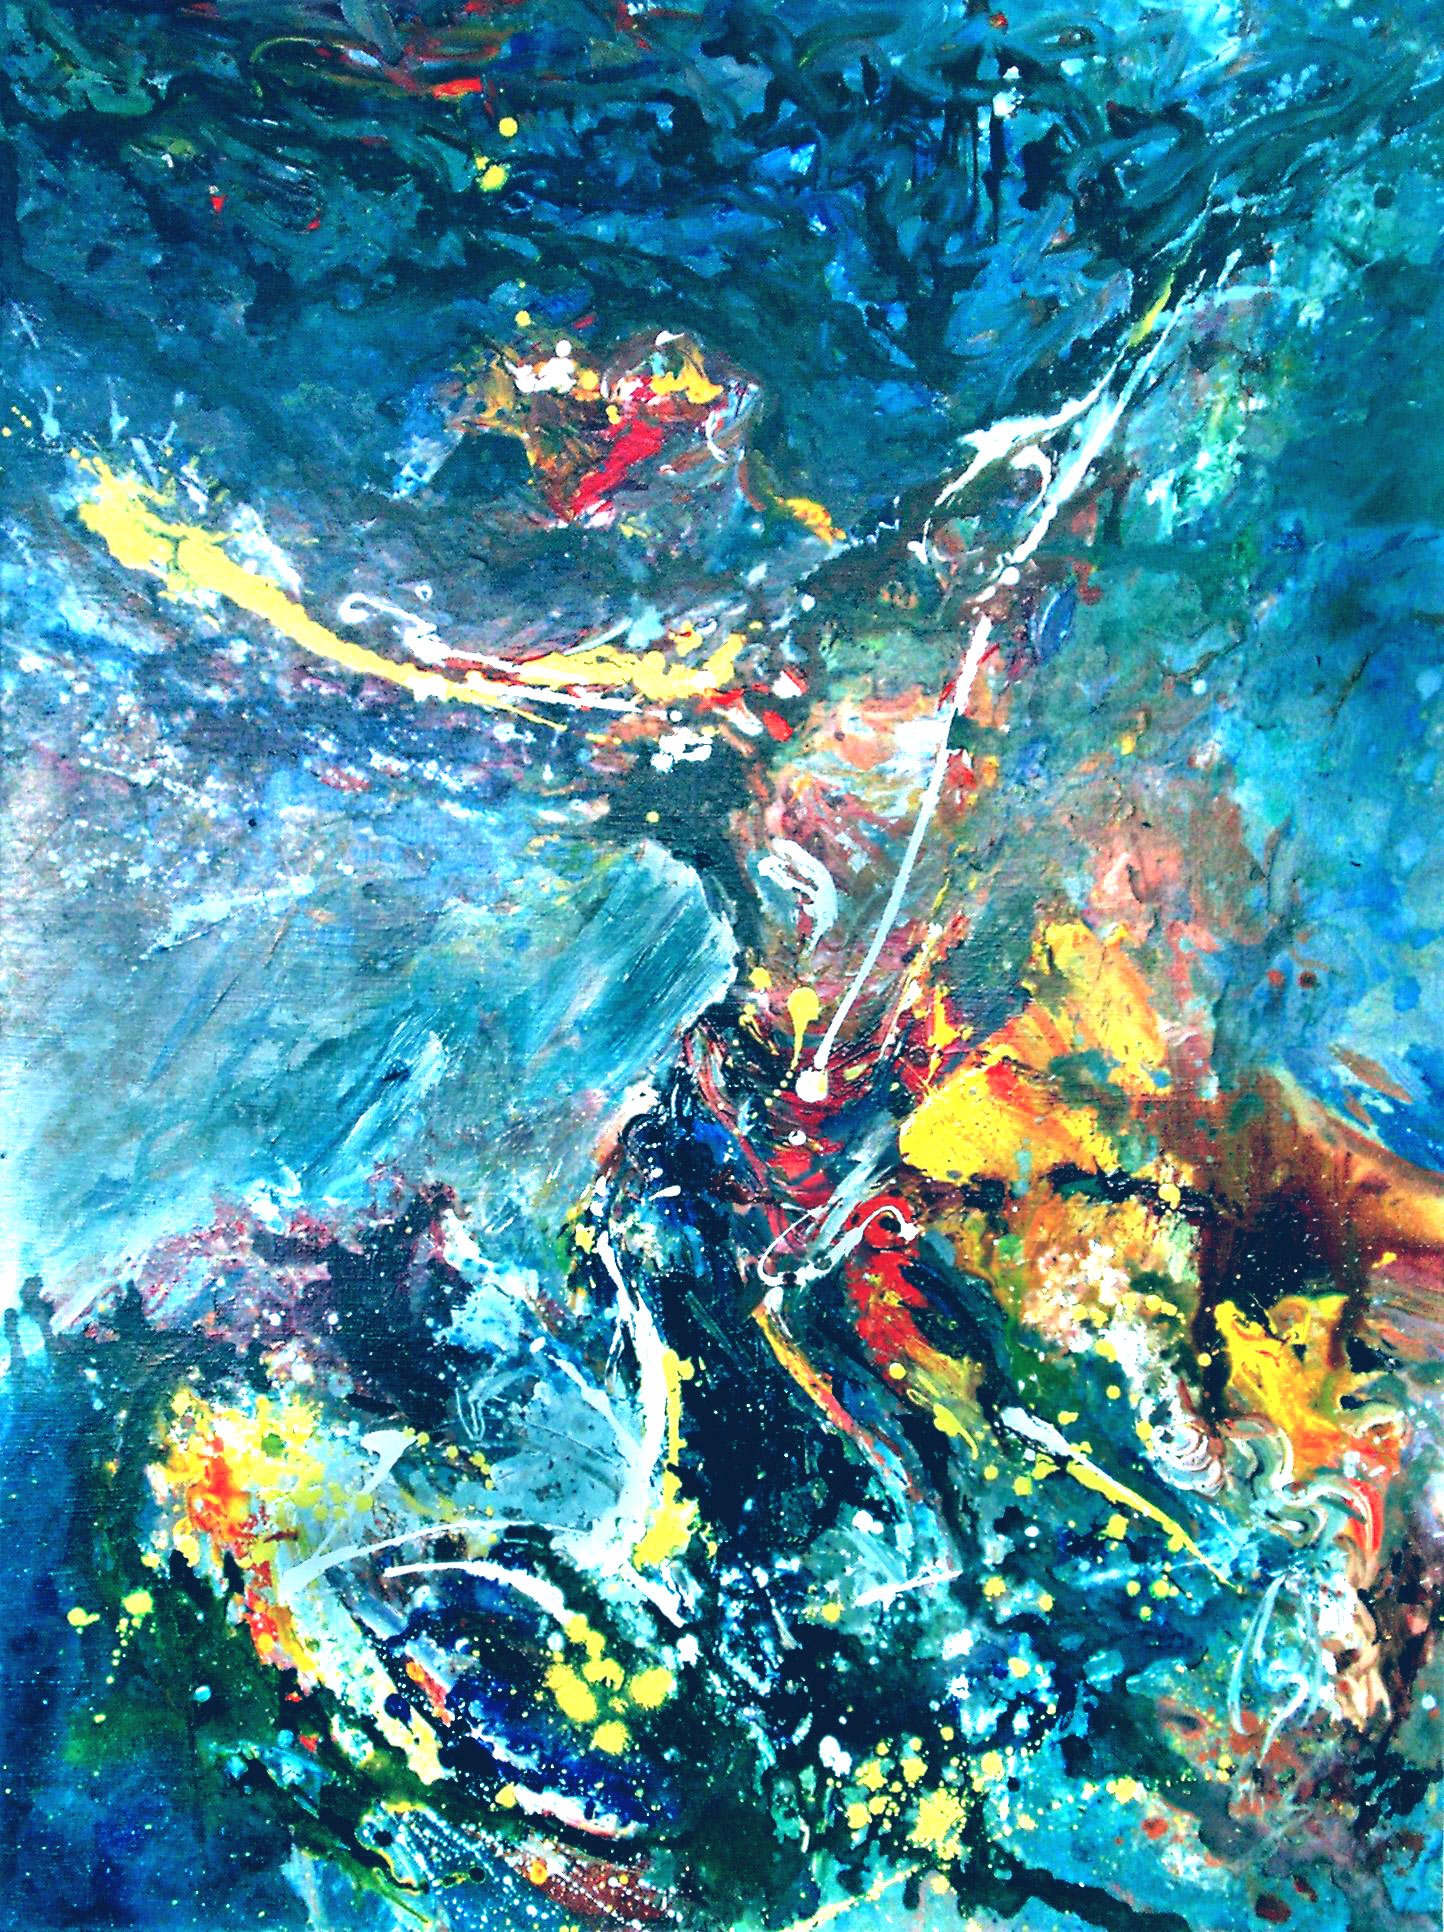 FREEDOM - 48 x 36, acrylic on canvas